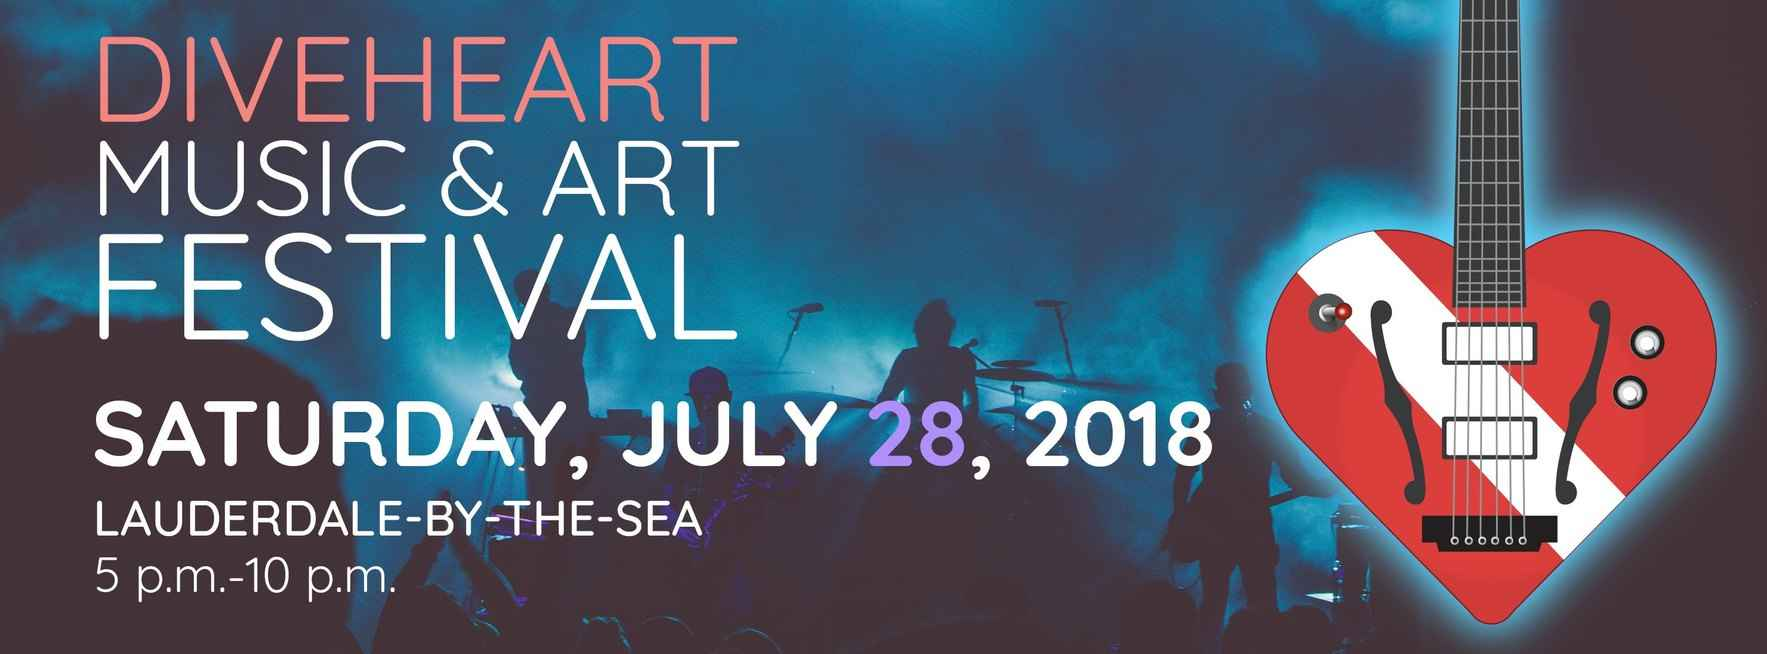 DIVEHEART MUSIC & ART FESTIVAL 2018 image